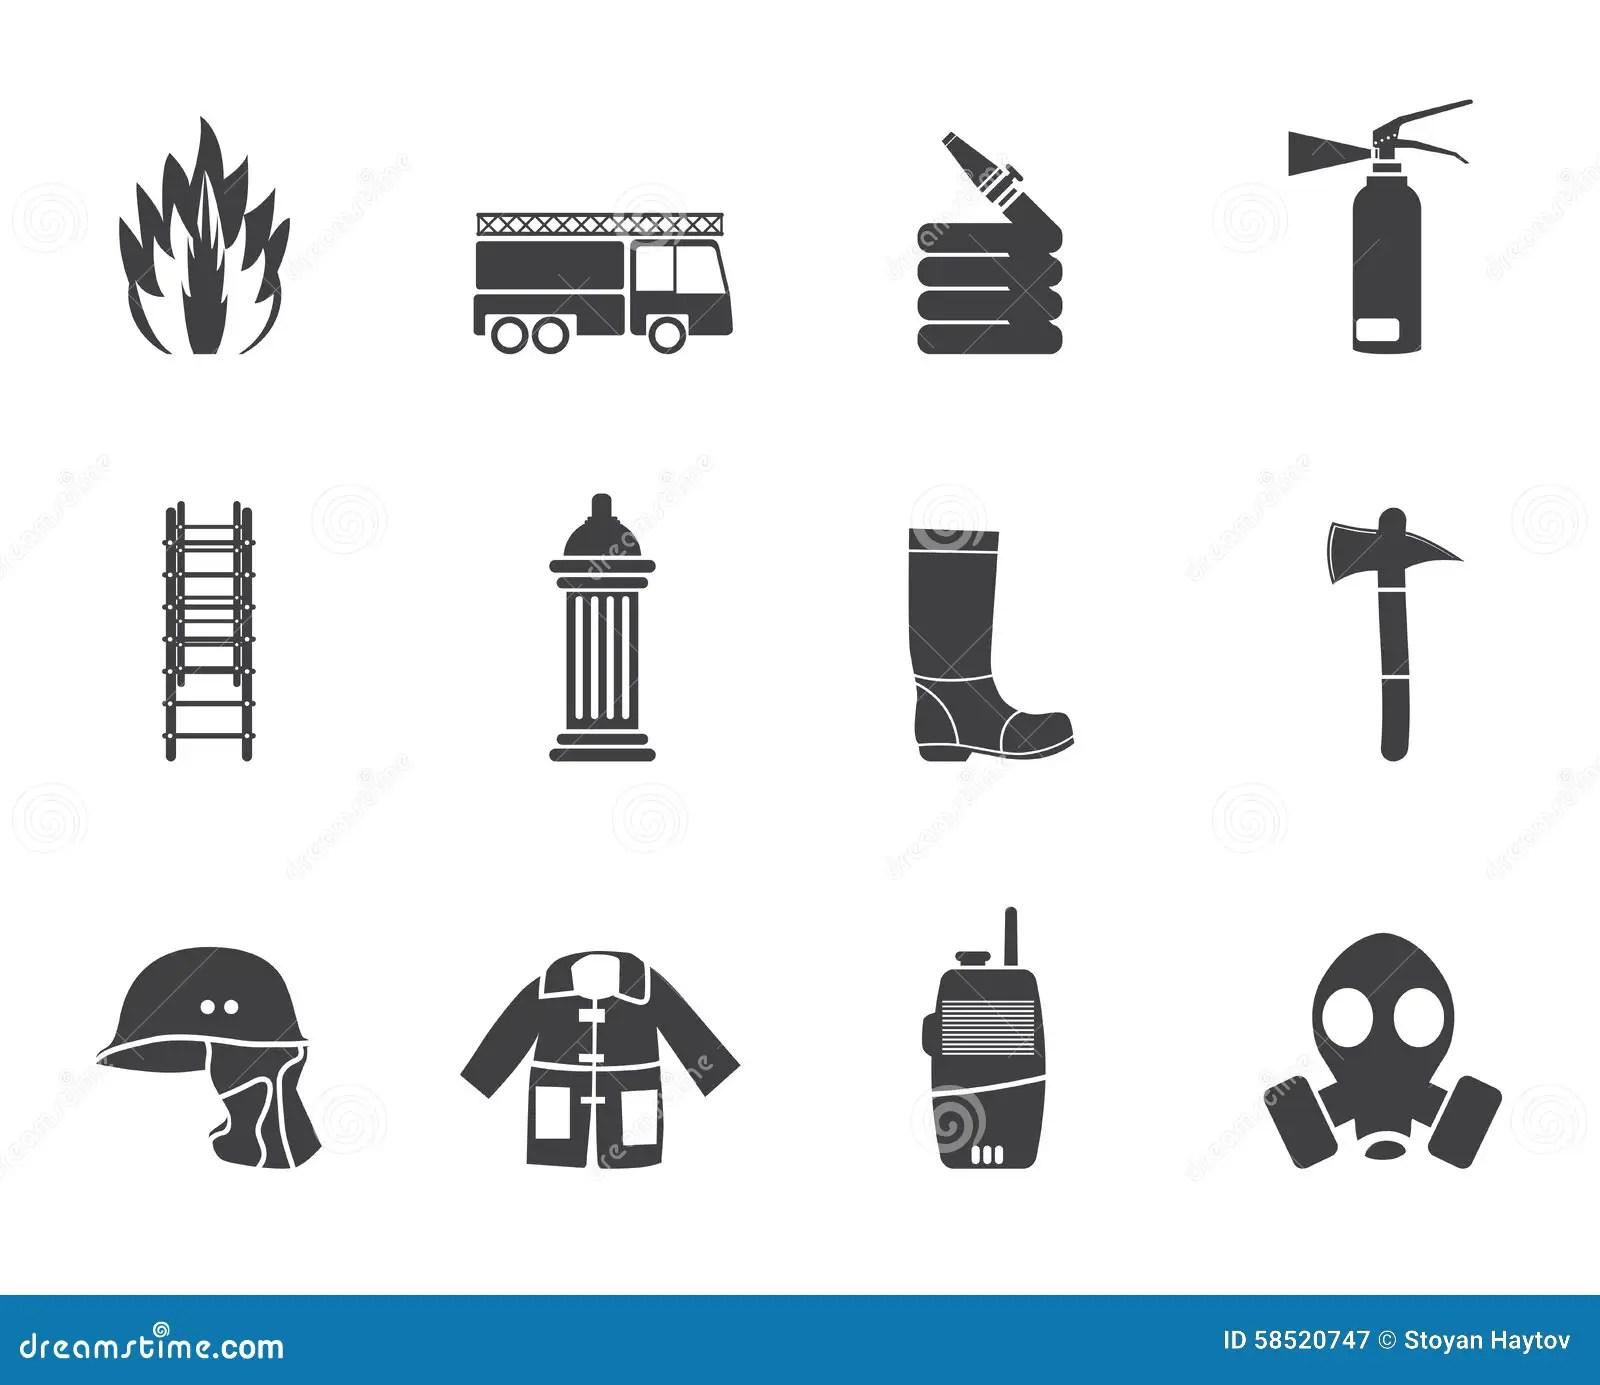 Simple Fire-brigade And Fireman Equipment Icon Cartoon